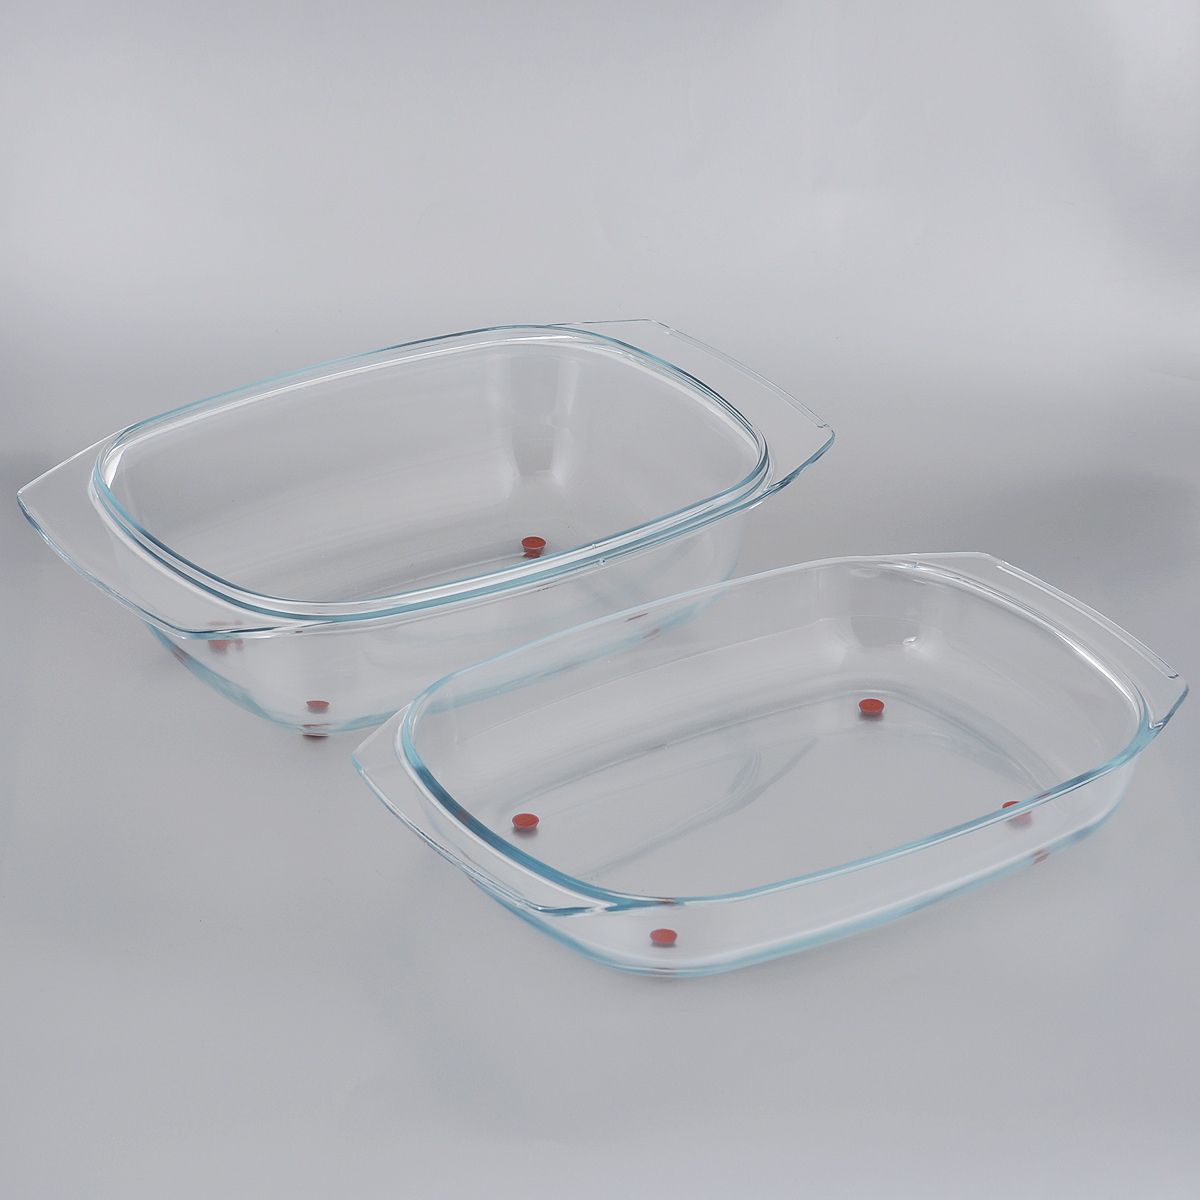 Жаровня Tescoma Delicia Glass с крышкой, 42 см х 26 см жаровня scovo сд 013 discovery